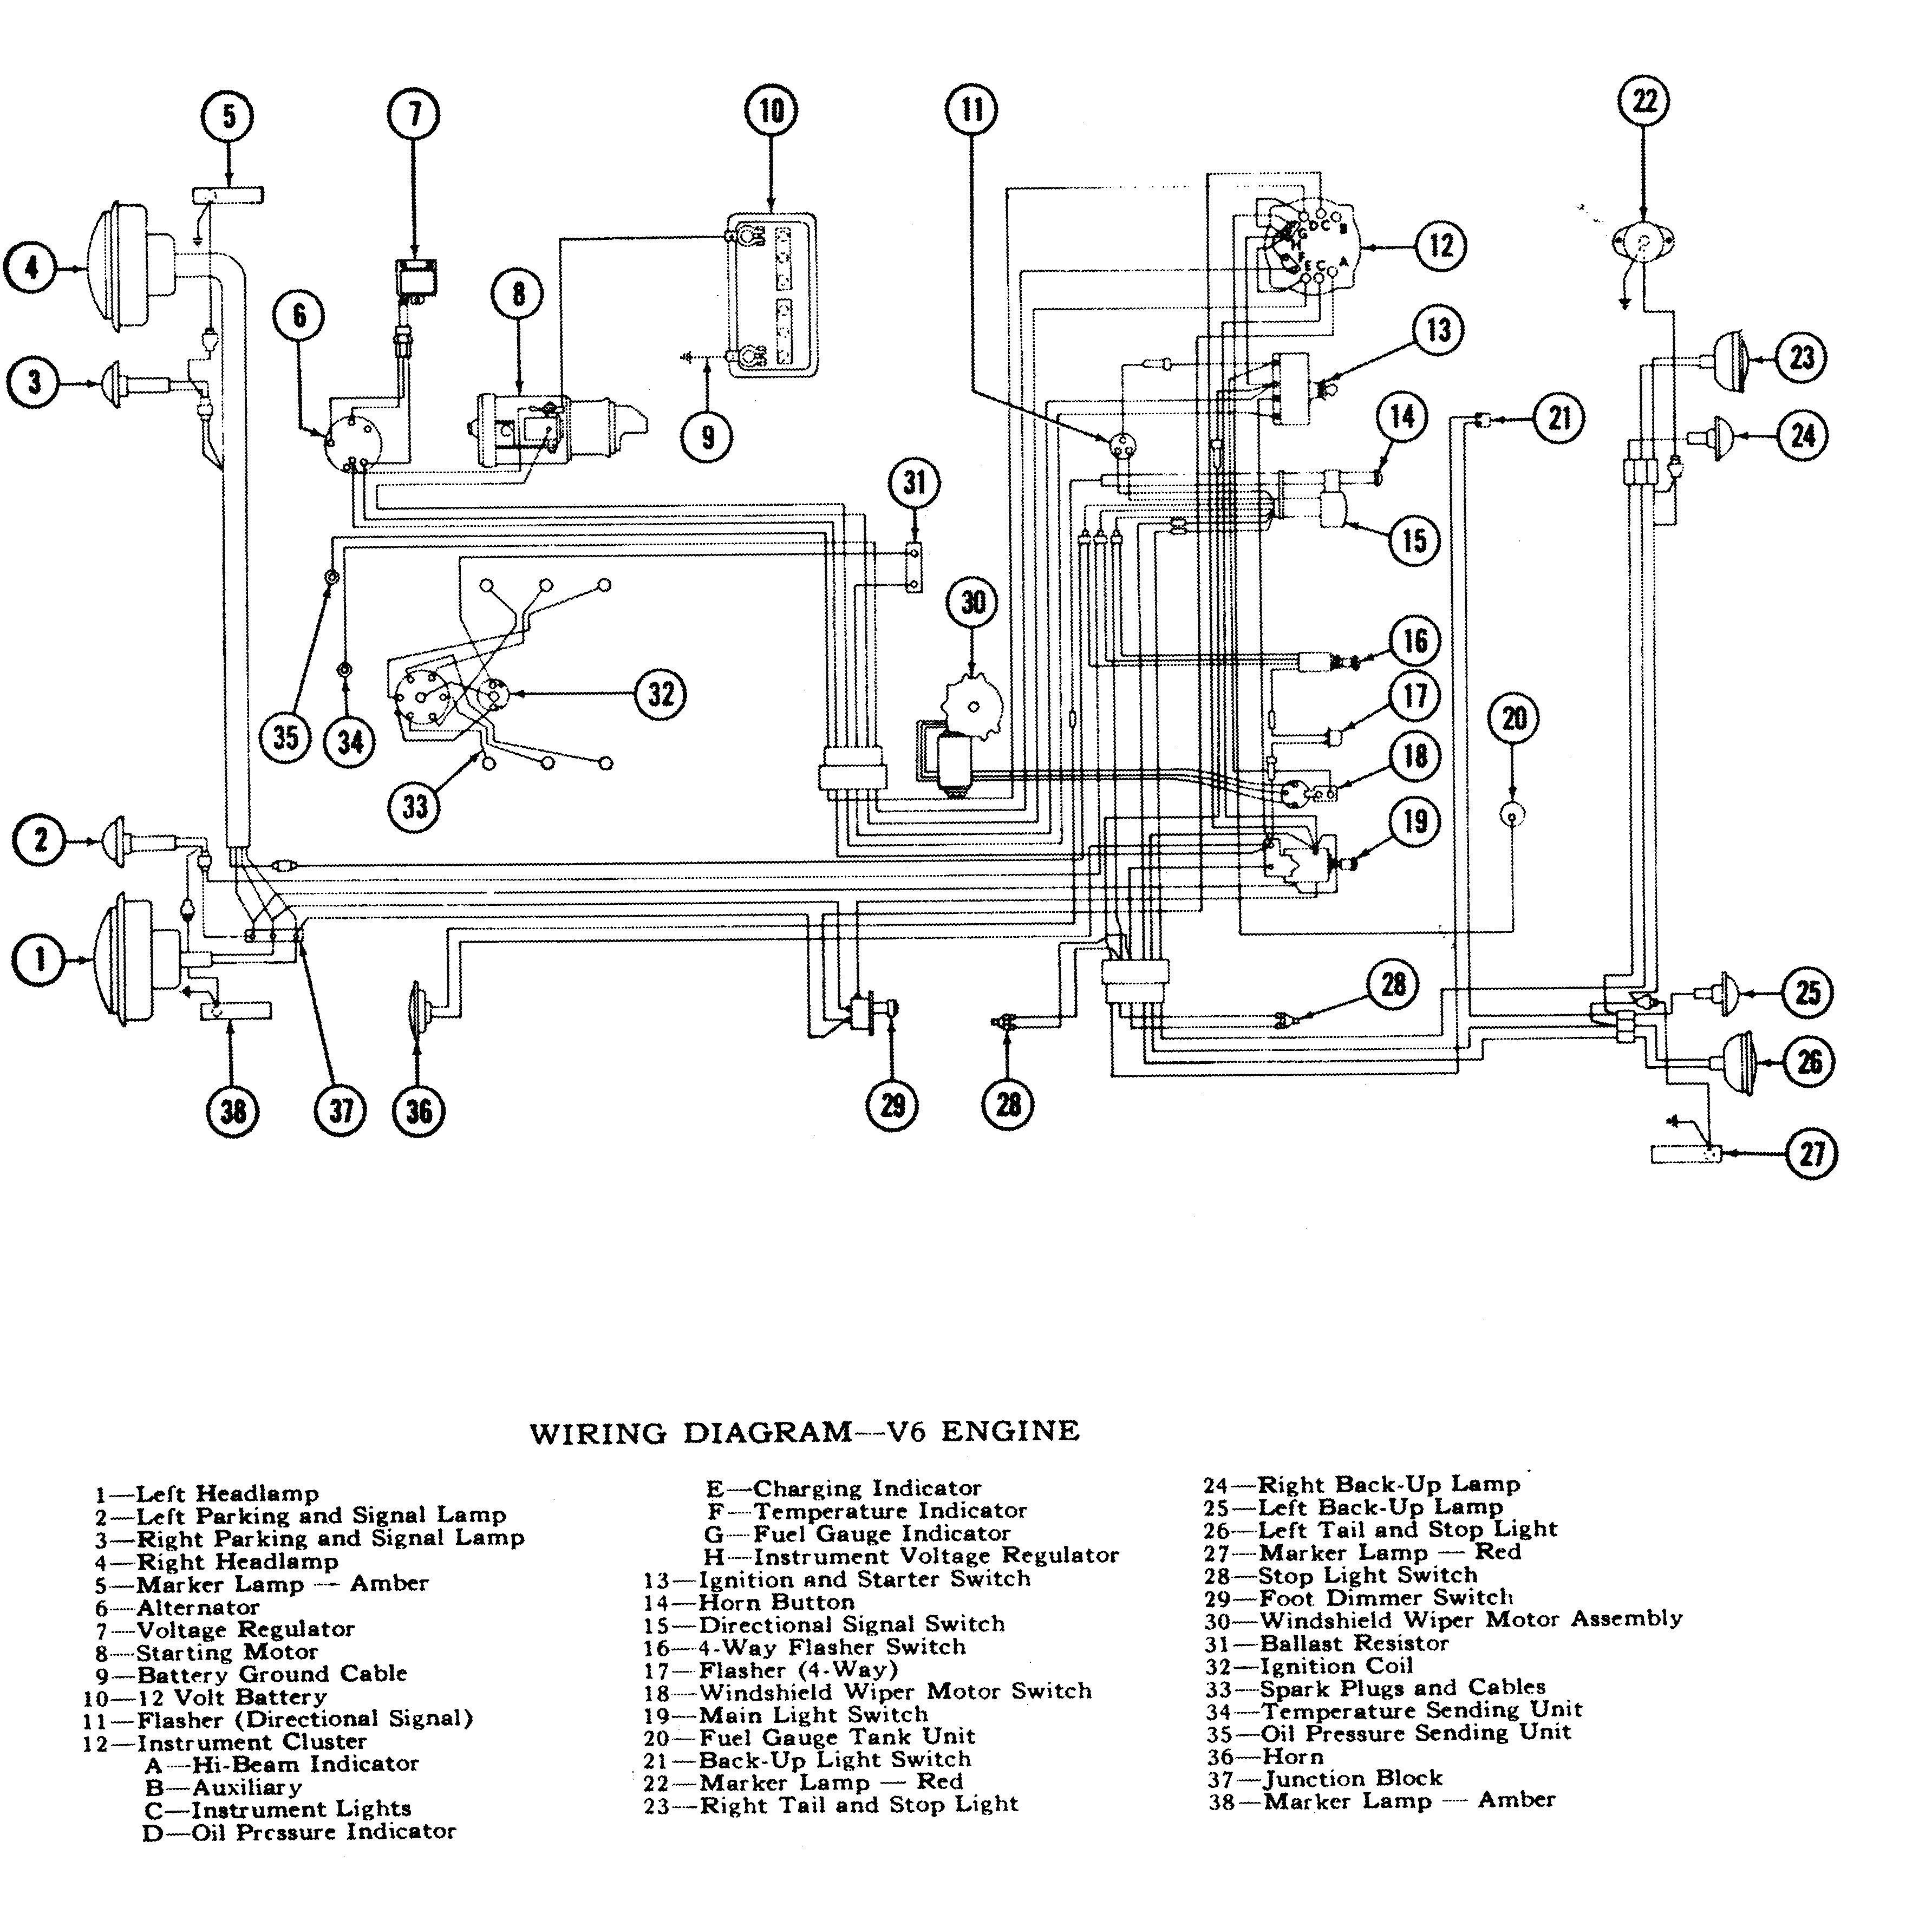 Inspirational ford Ballast Resistor Wiring Diagram